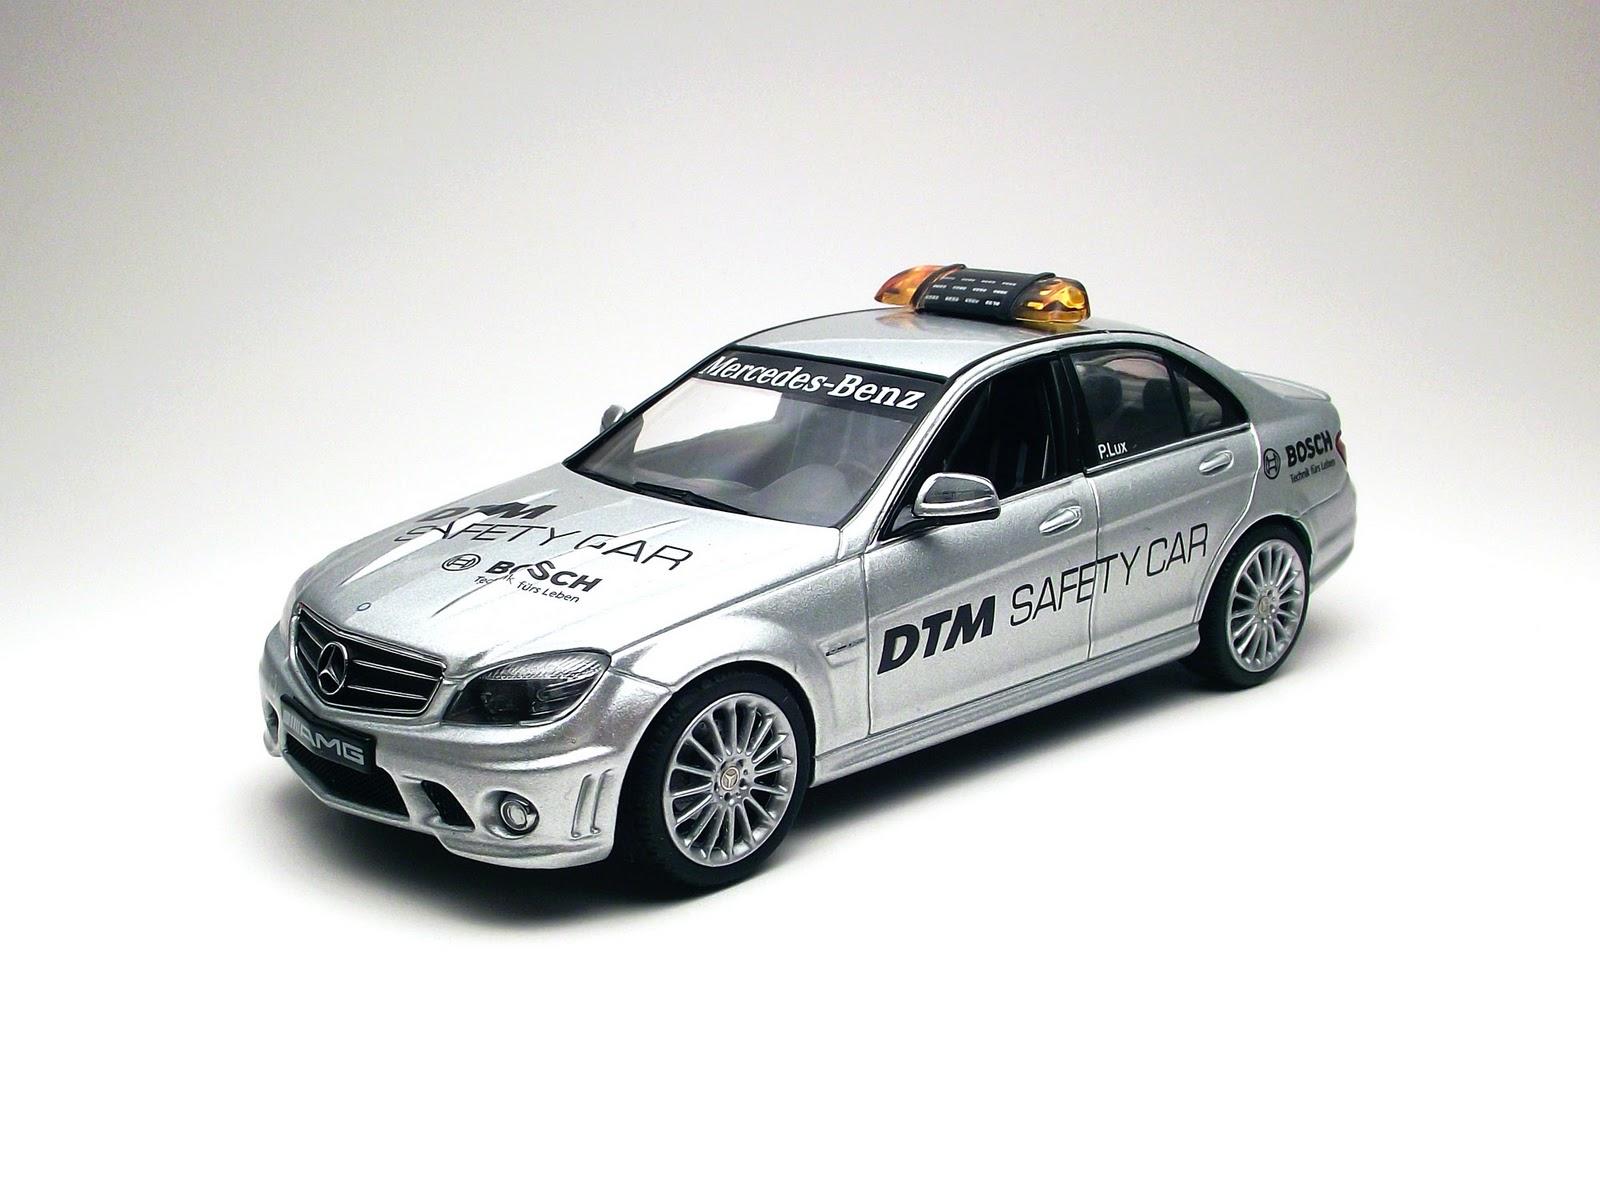 Diecast 143 Mercedesbenz C63 Amg Dtm Safety Car  143